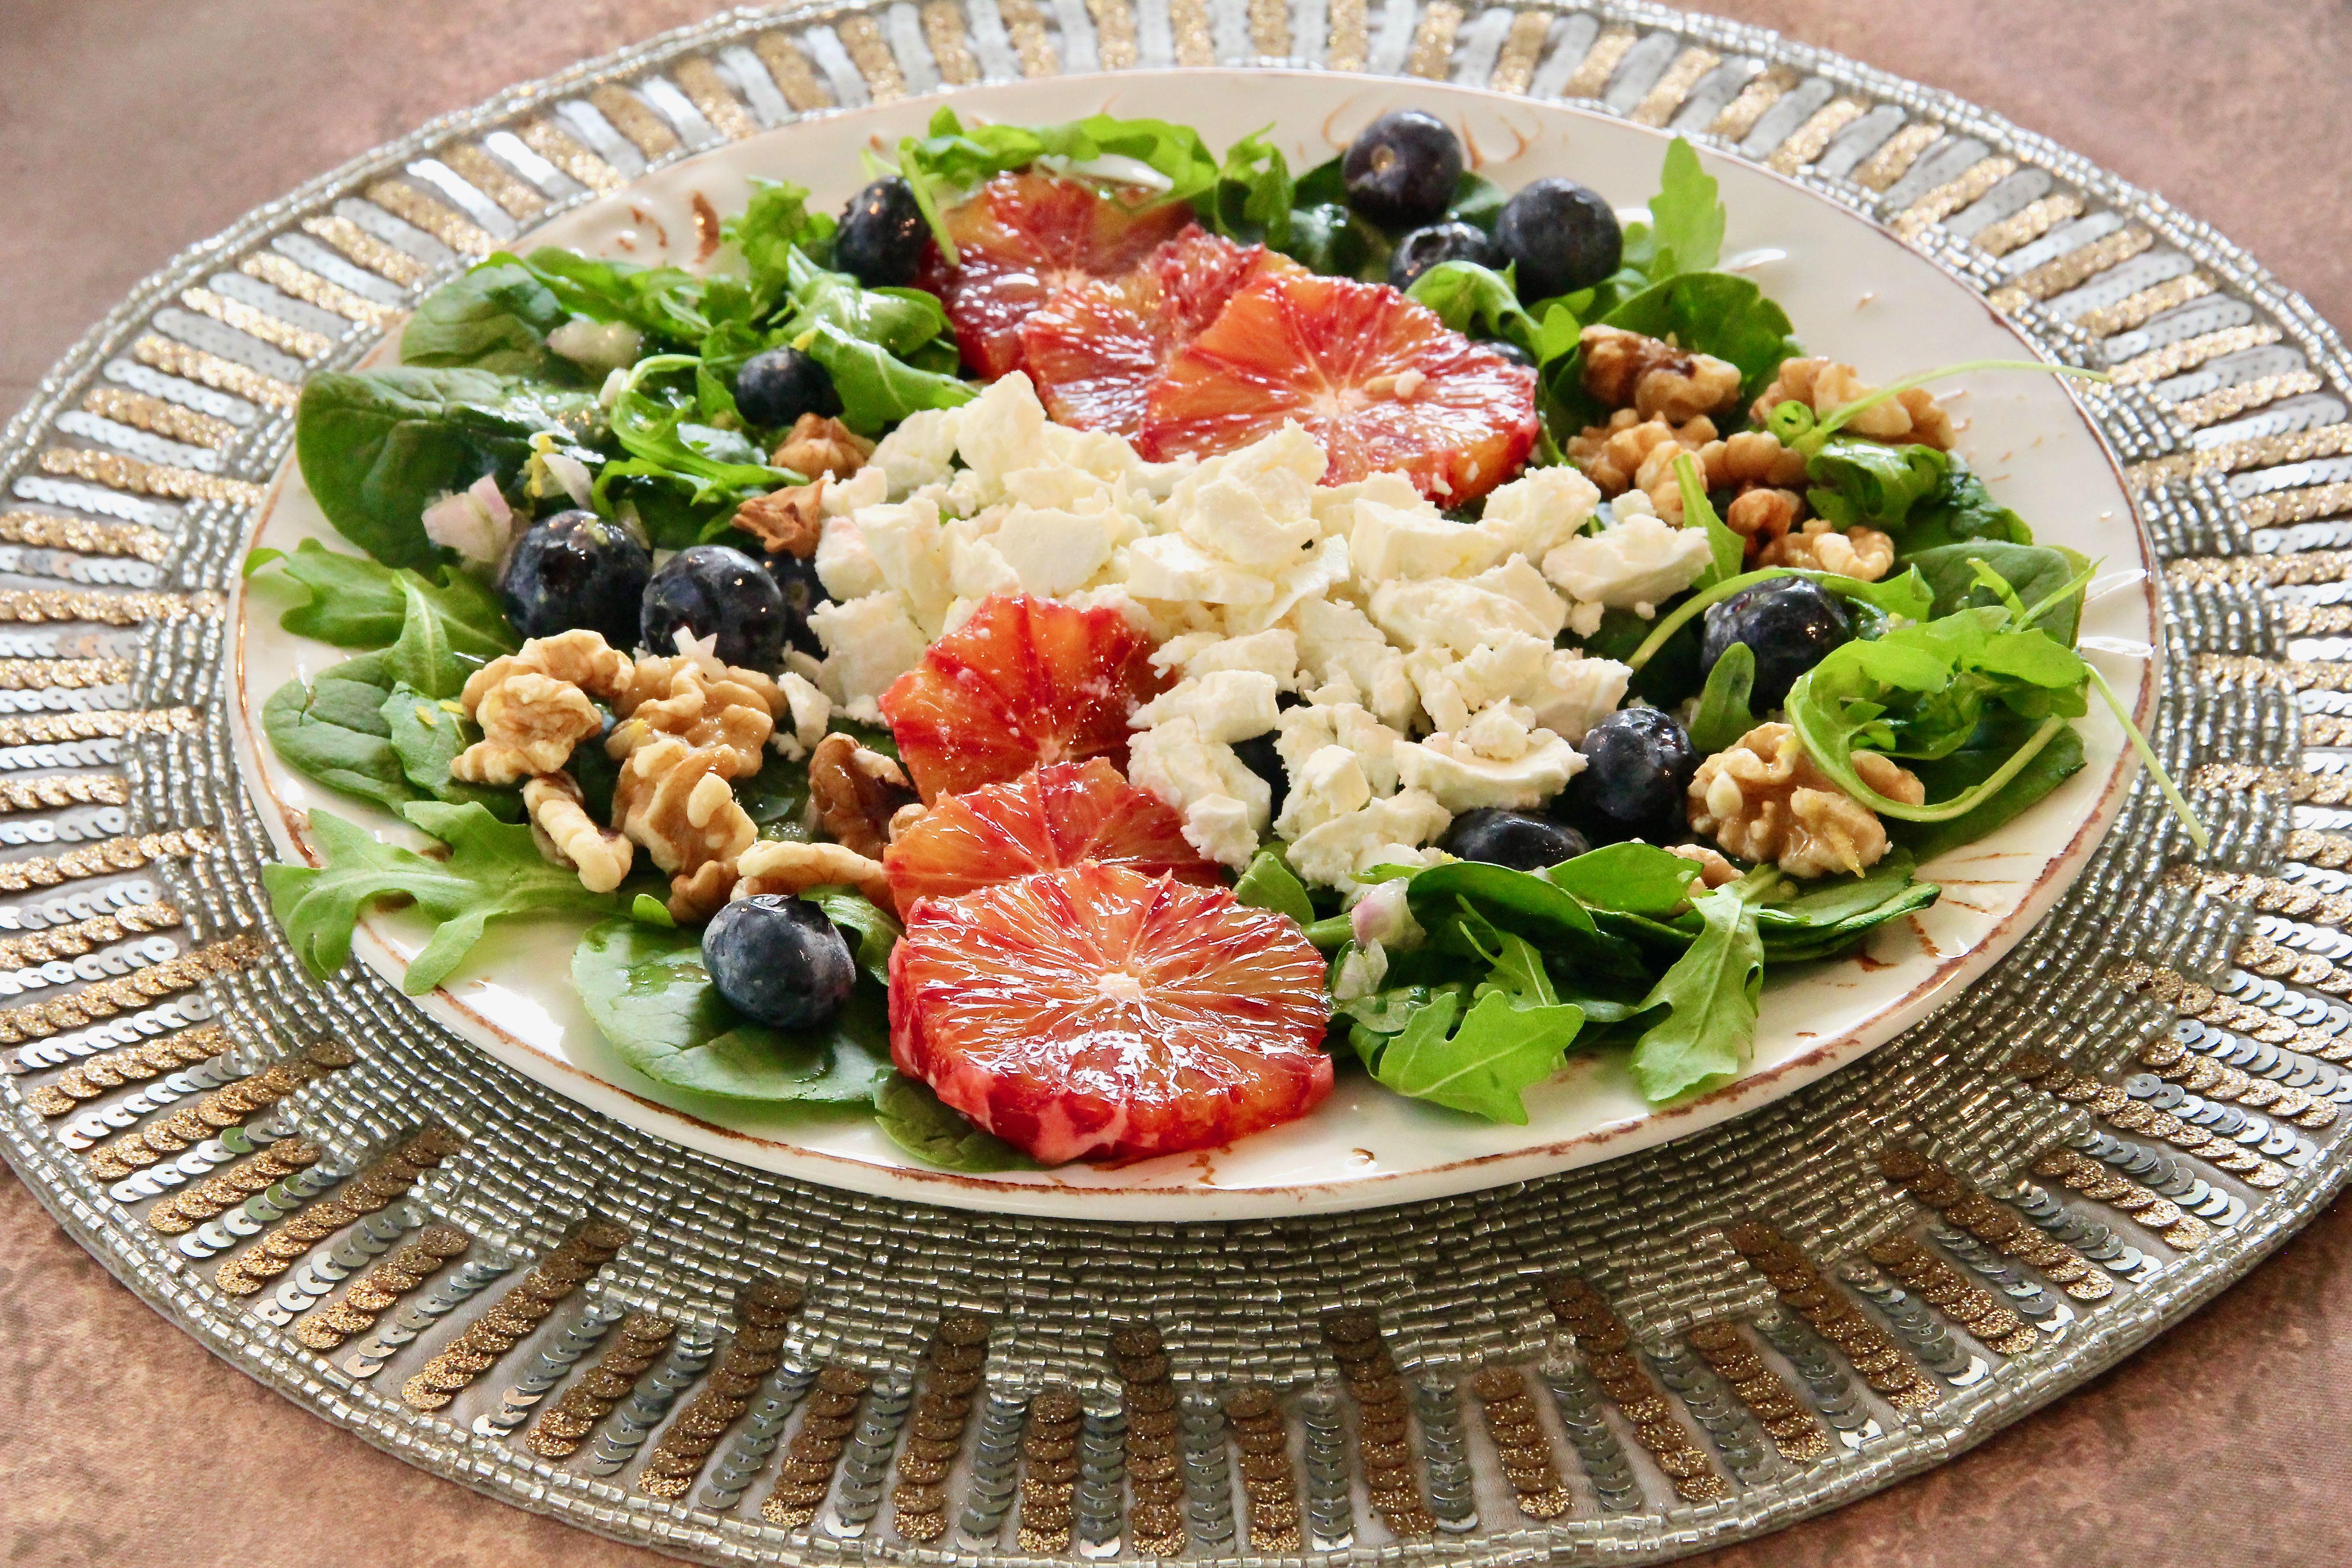 Blood Orange, Blueberry, and Feta Salad